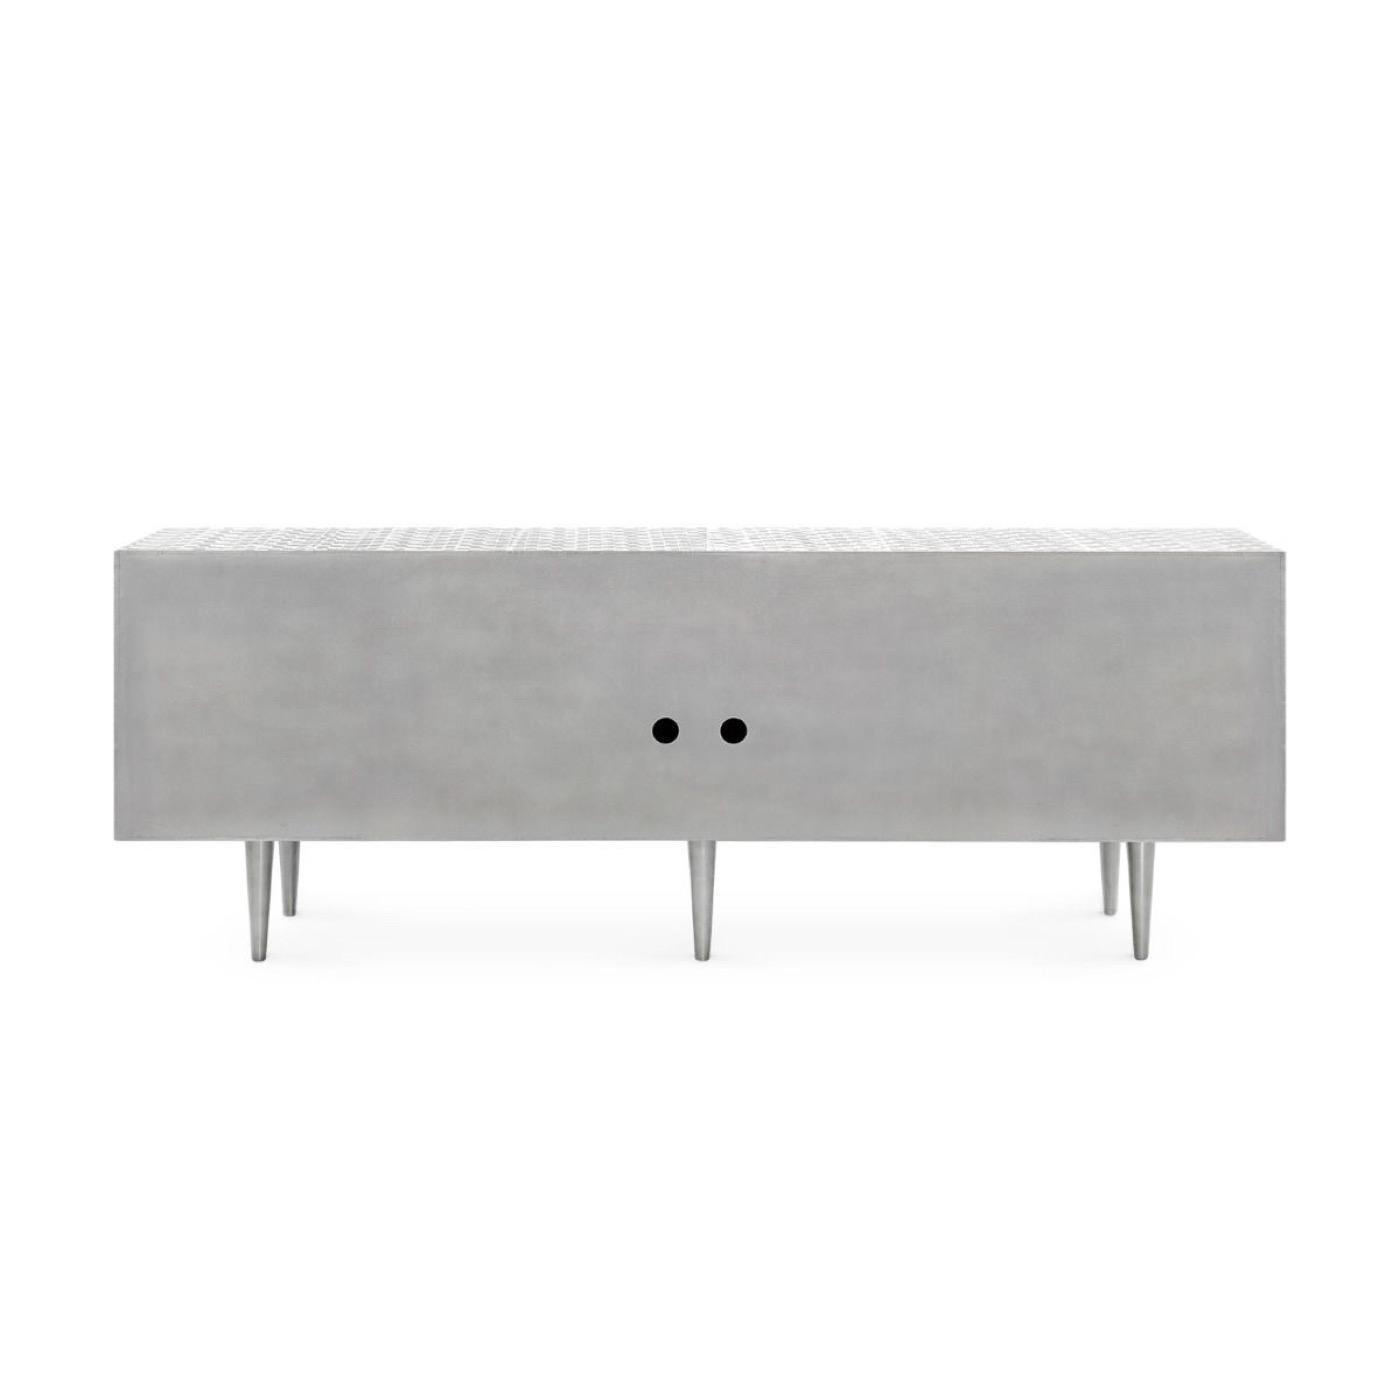 Grammer Metal Clad Cabinet | Nickel